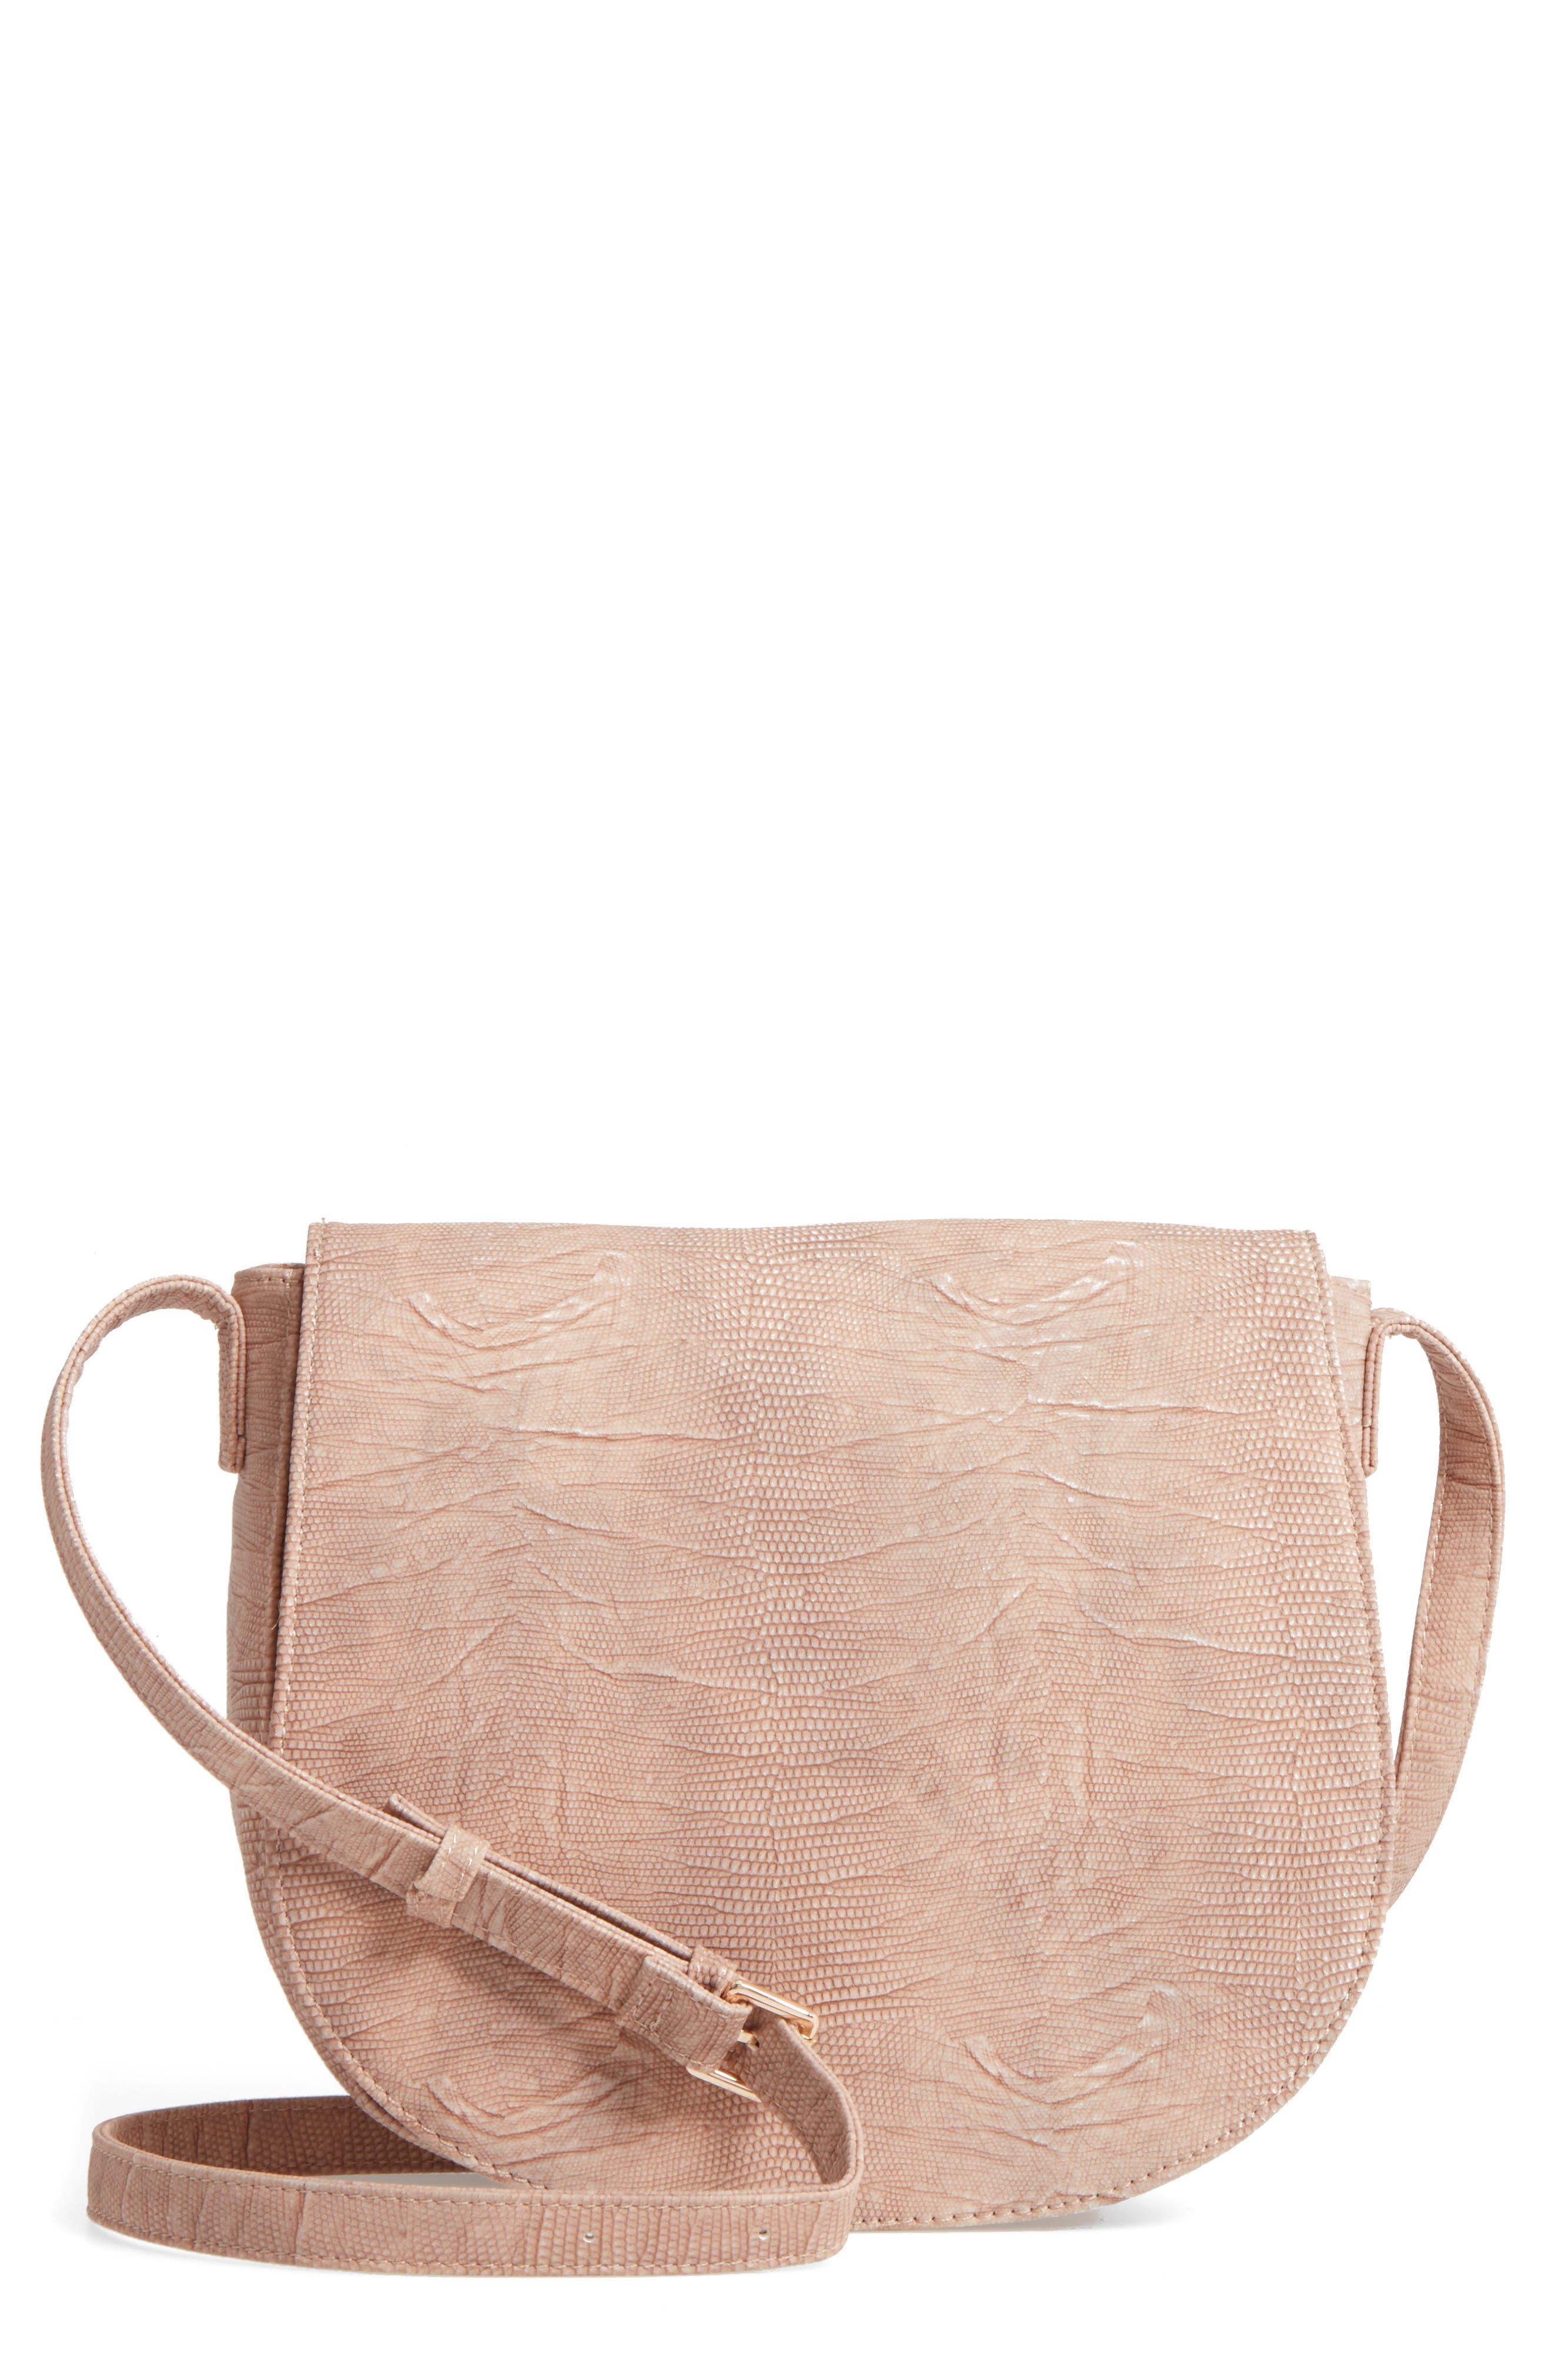 Livvy Faux Leather Crossbody Saddle Bag,                             Main thumbnail 2, color,